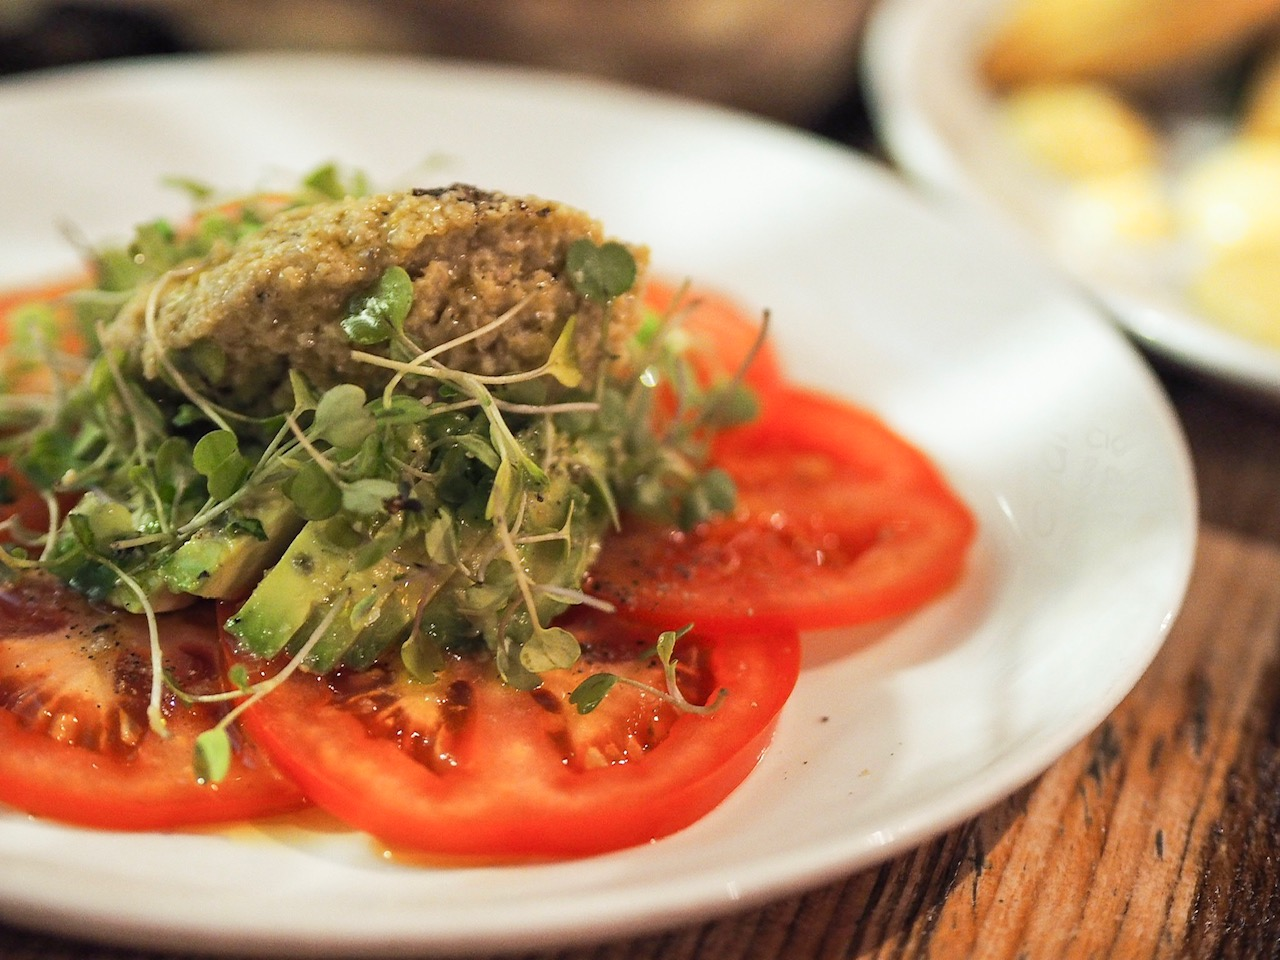 Tomato and avocado salad at Evuna, Manchester.